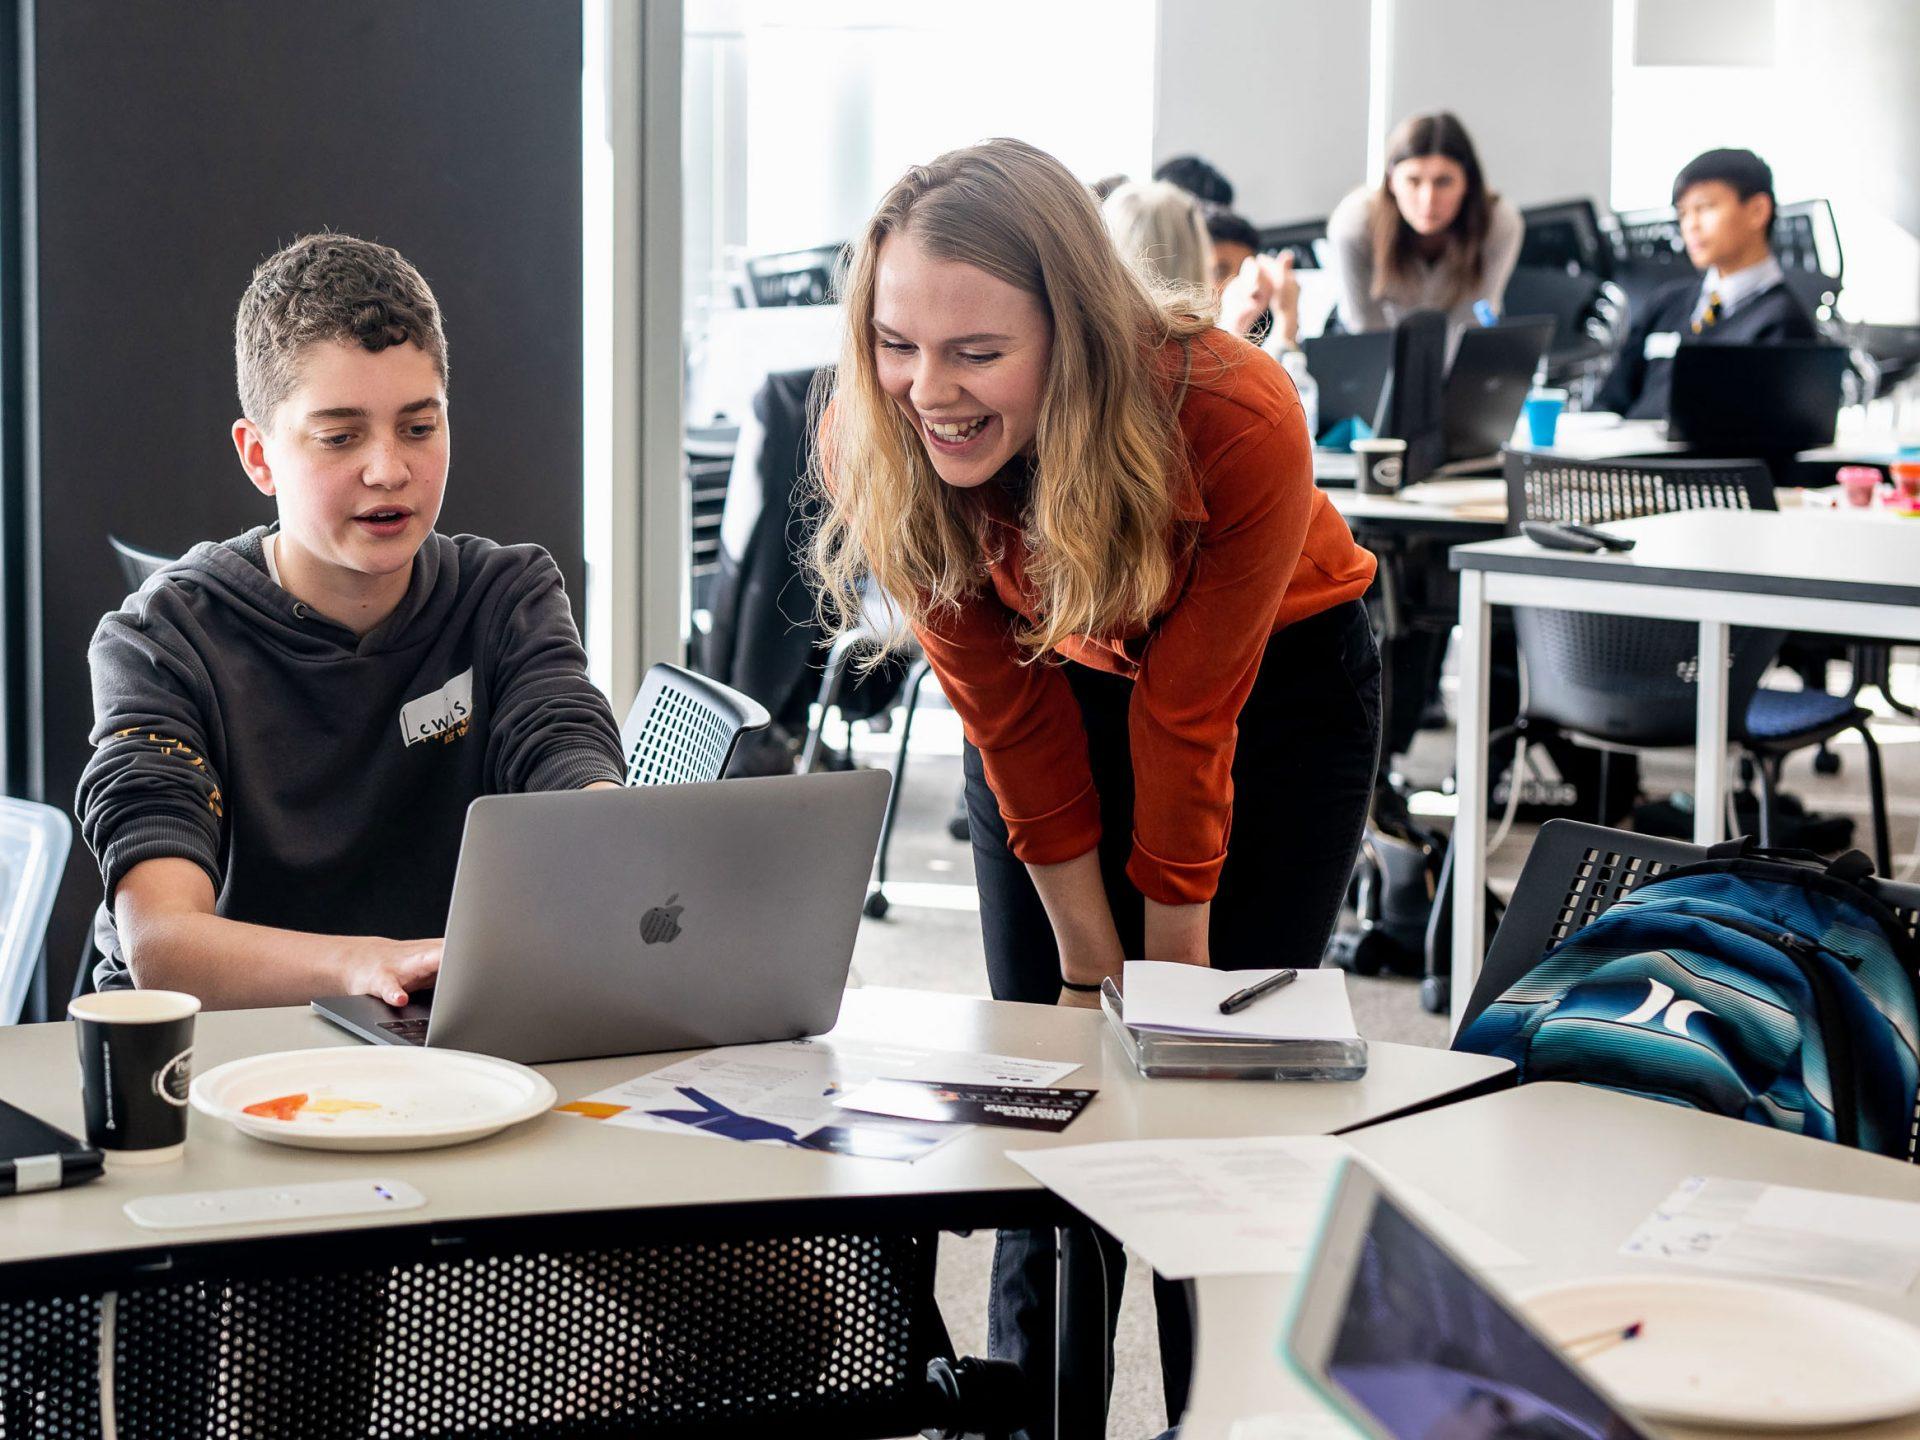 Geena mentoring students